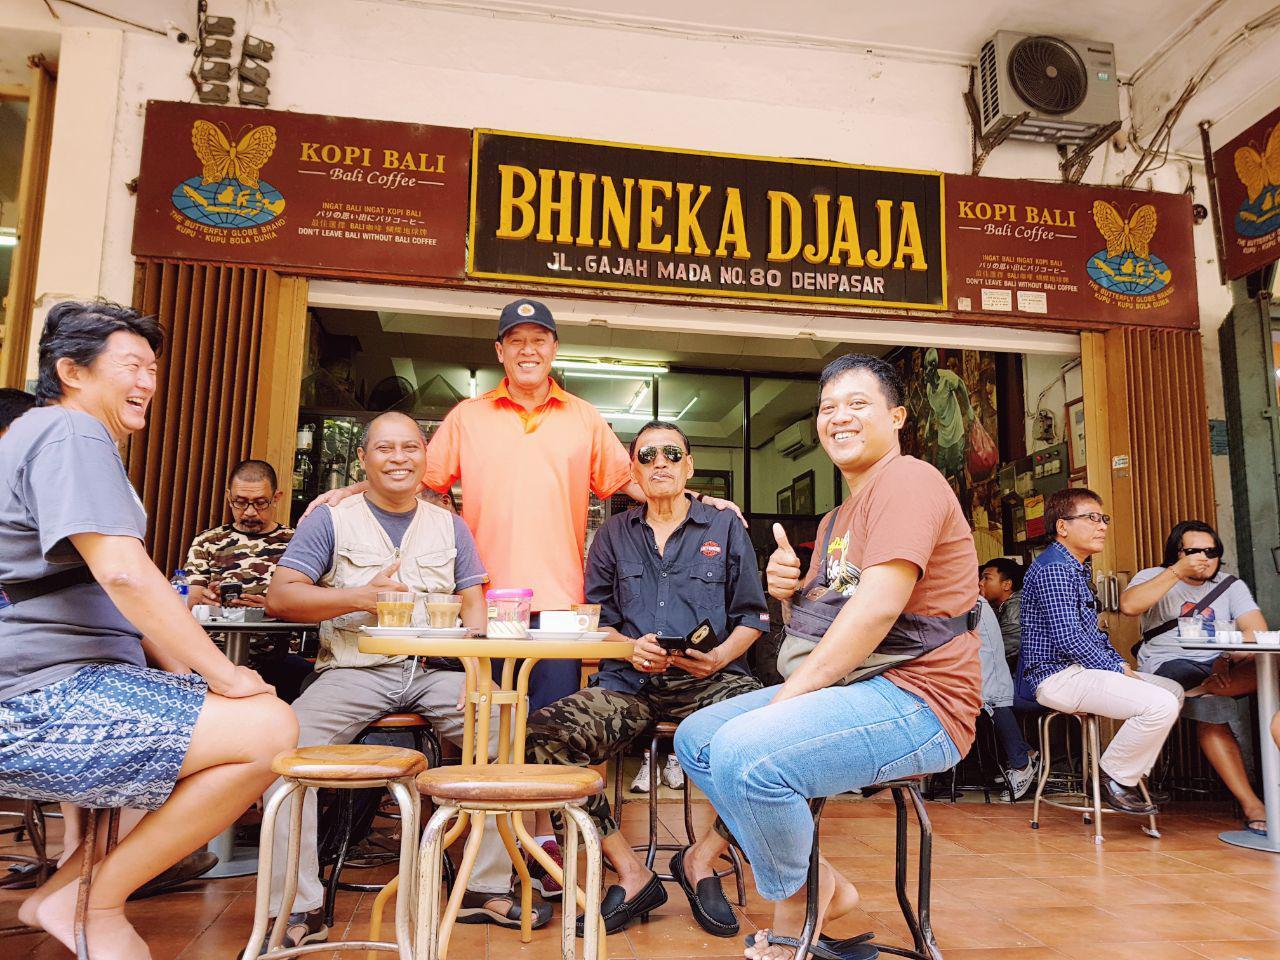 Bhineka Djaja Family